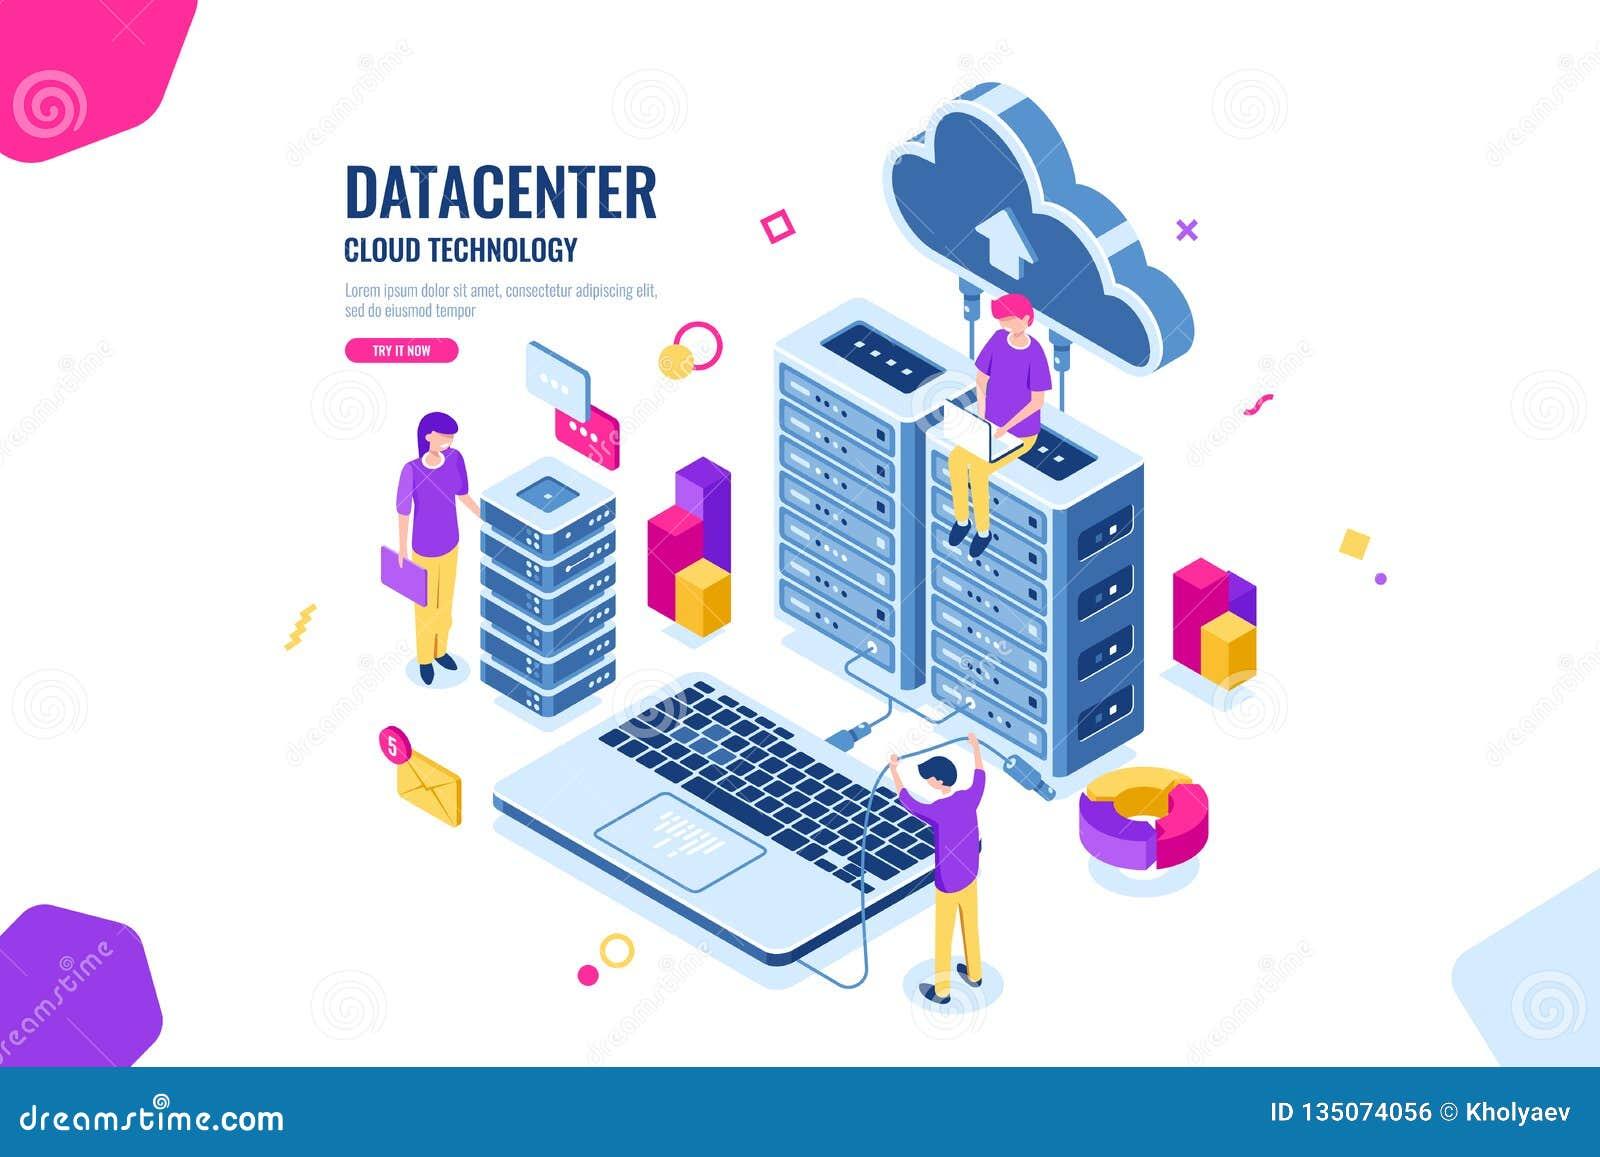 Isometric ασφάλεια δεδομένων, μηχανικός υπολογιστών, κέντρο δεδομένων και δωμάτιο κεντρικών υπολογιστών, σύννεφο που υπολογίζει,